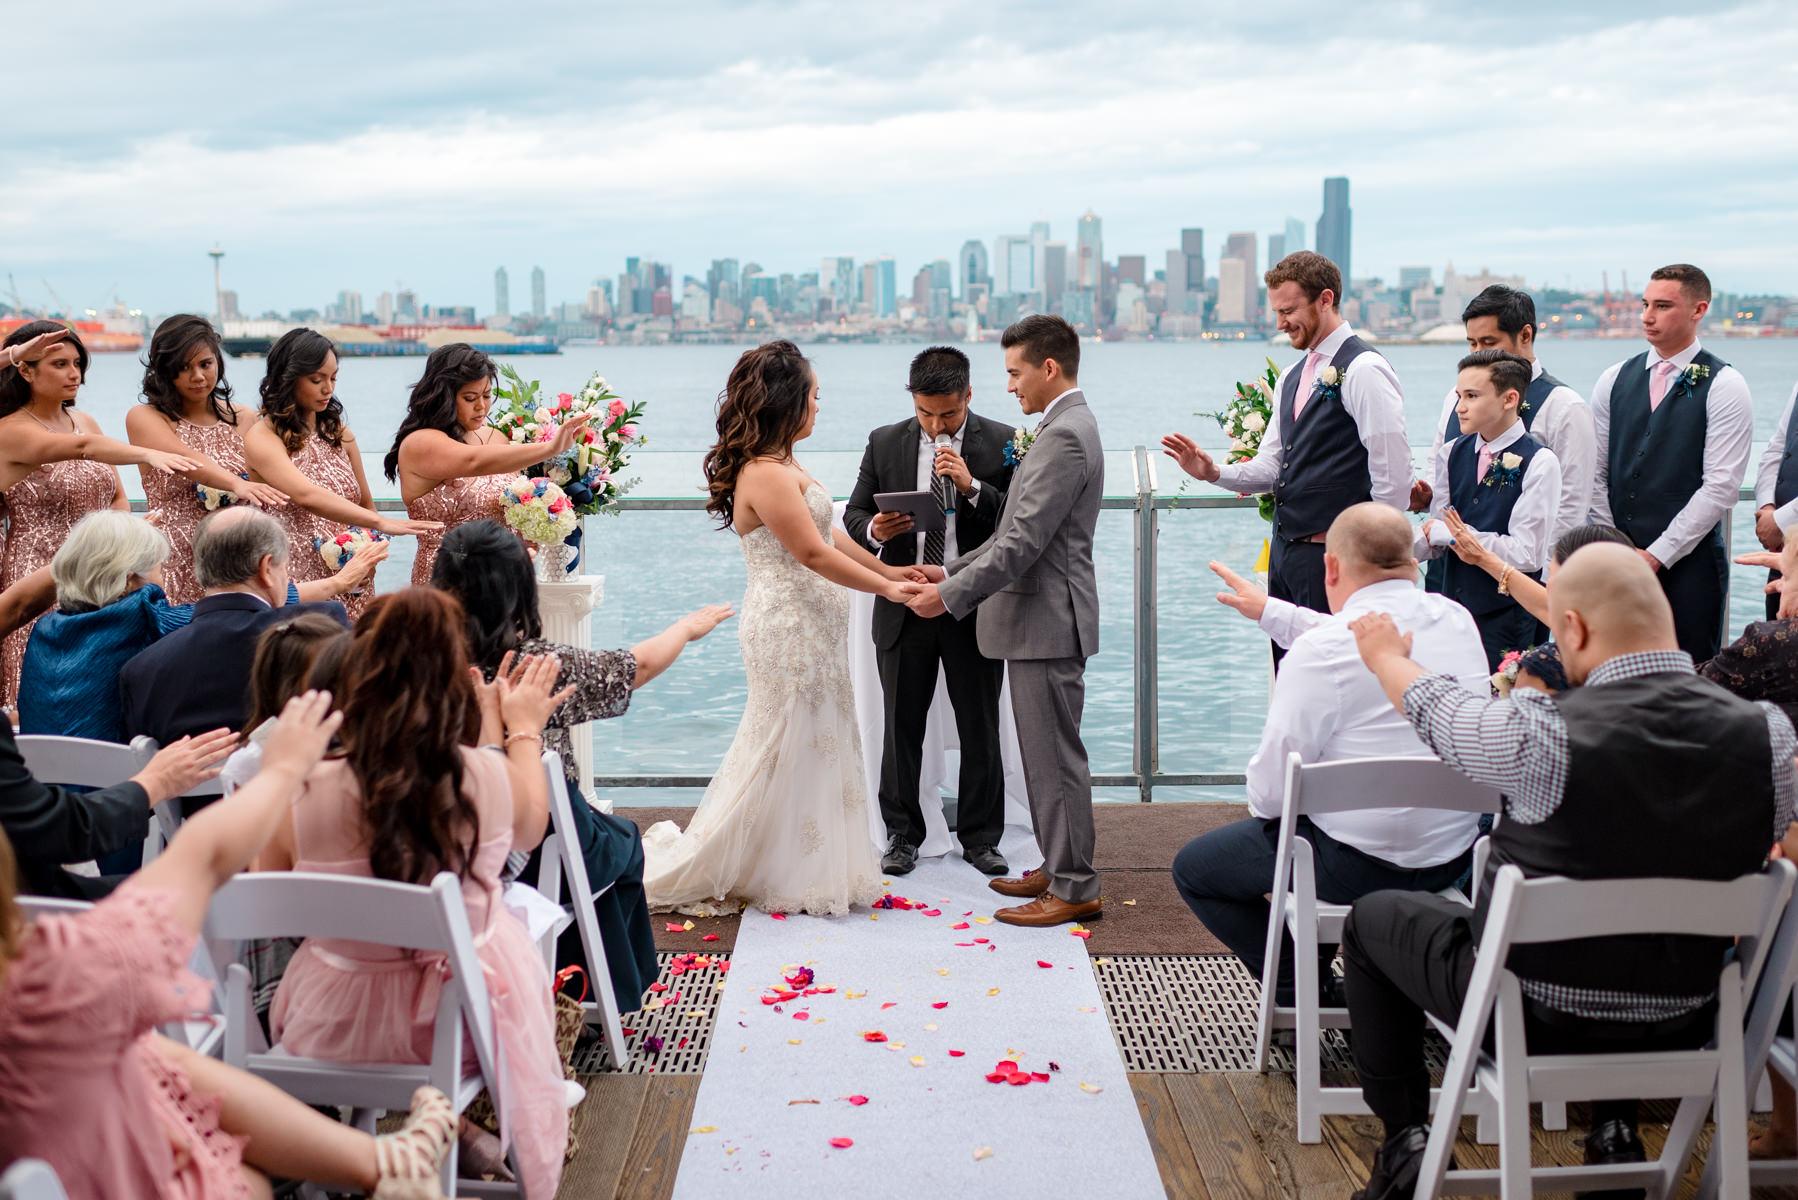 Andrew Tat - Documentary Wedding Photography - Salty's - Seattle, Washington -Mark & Marcy - 15.jpg